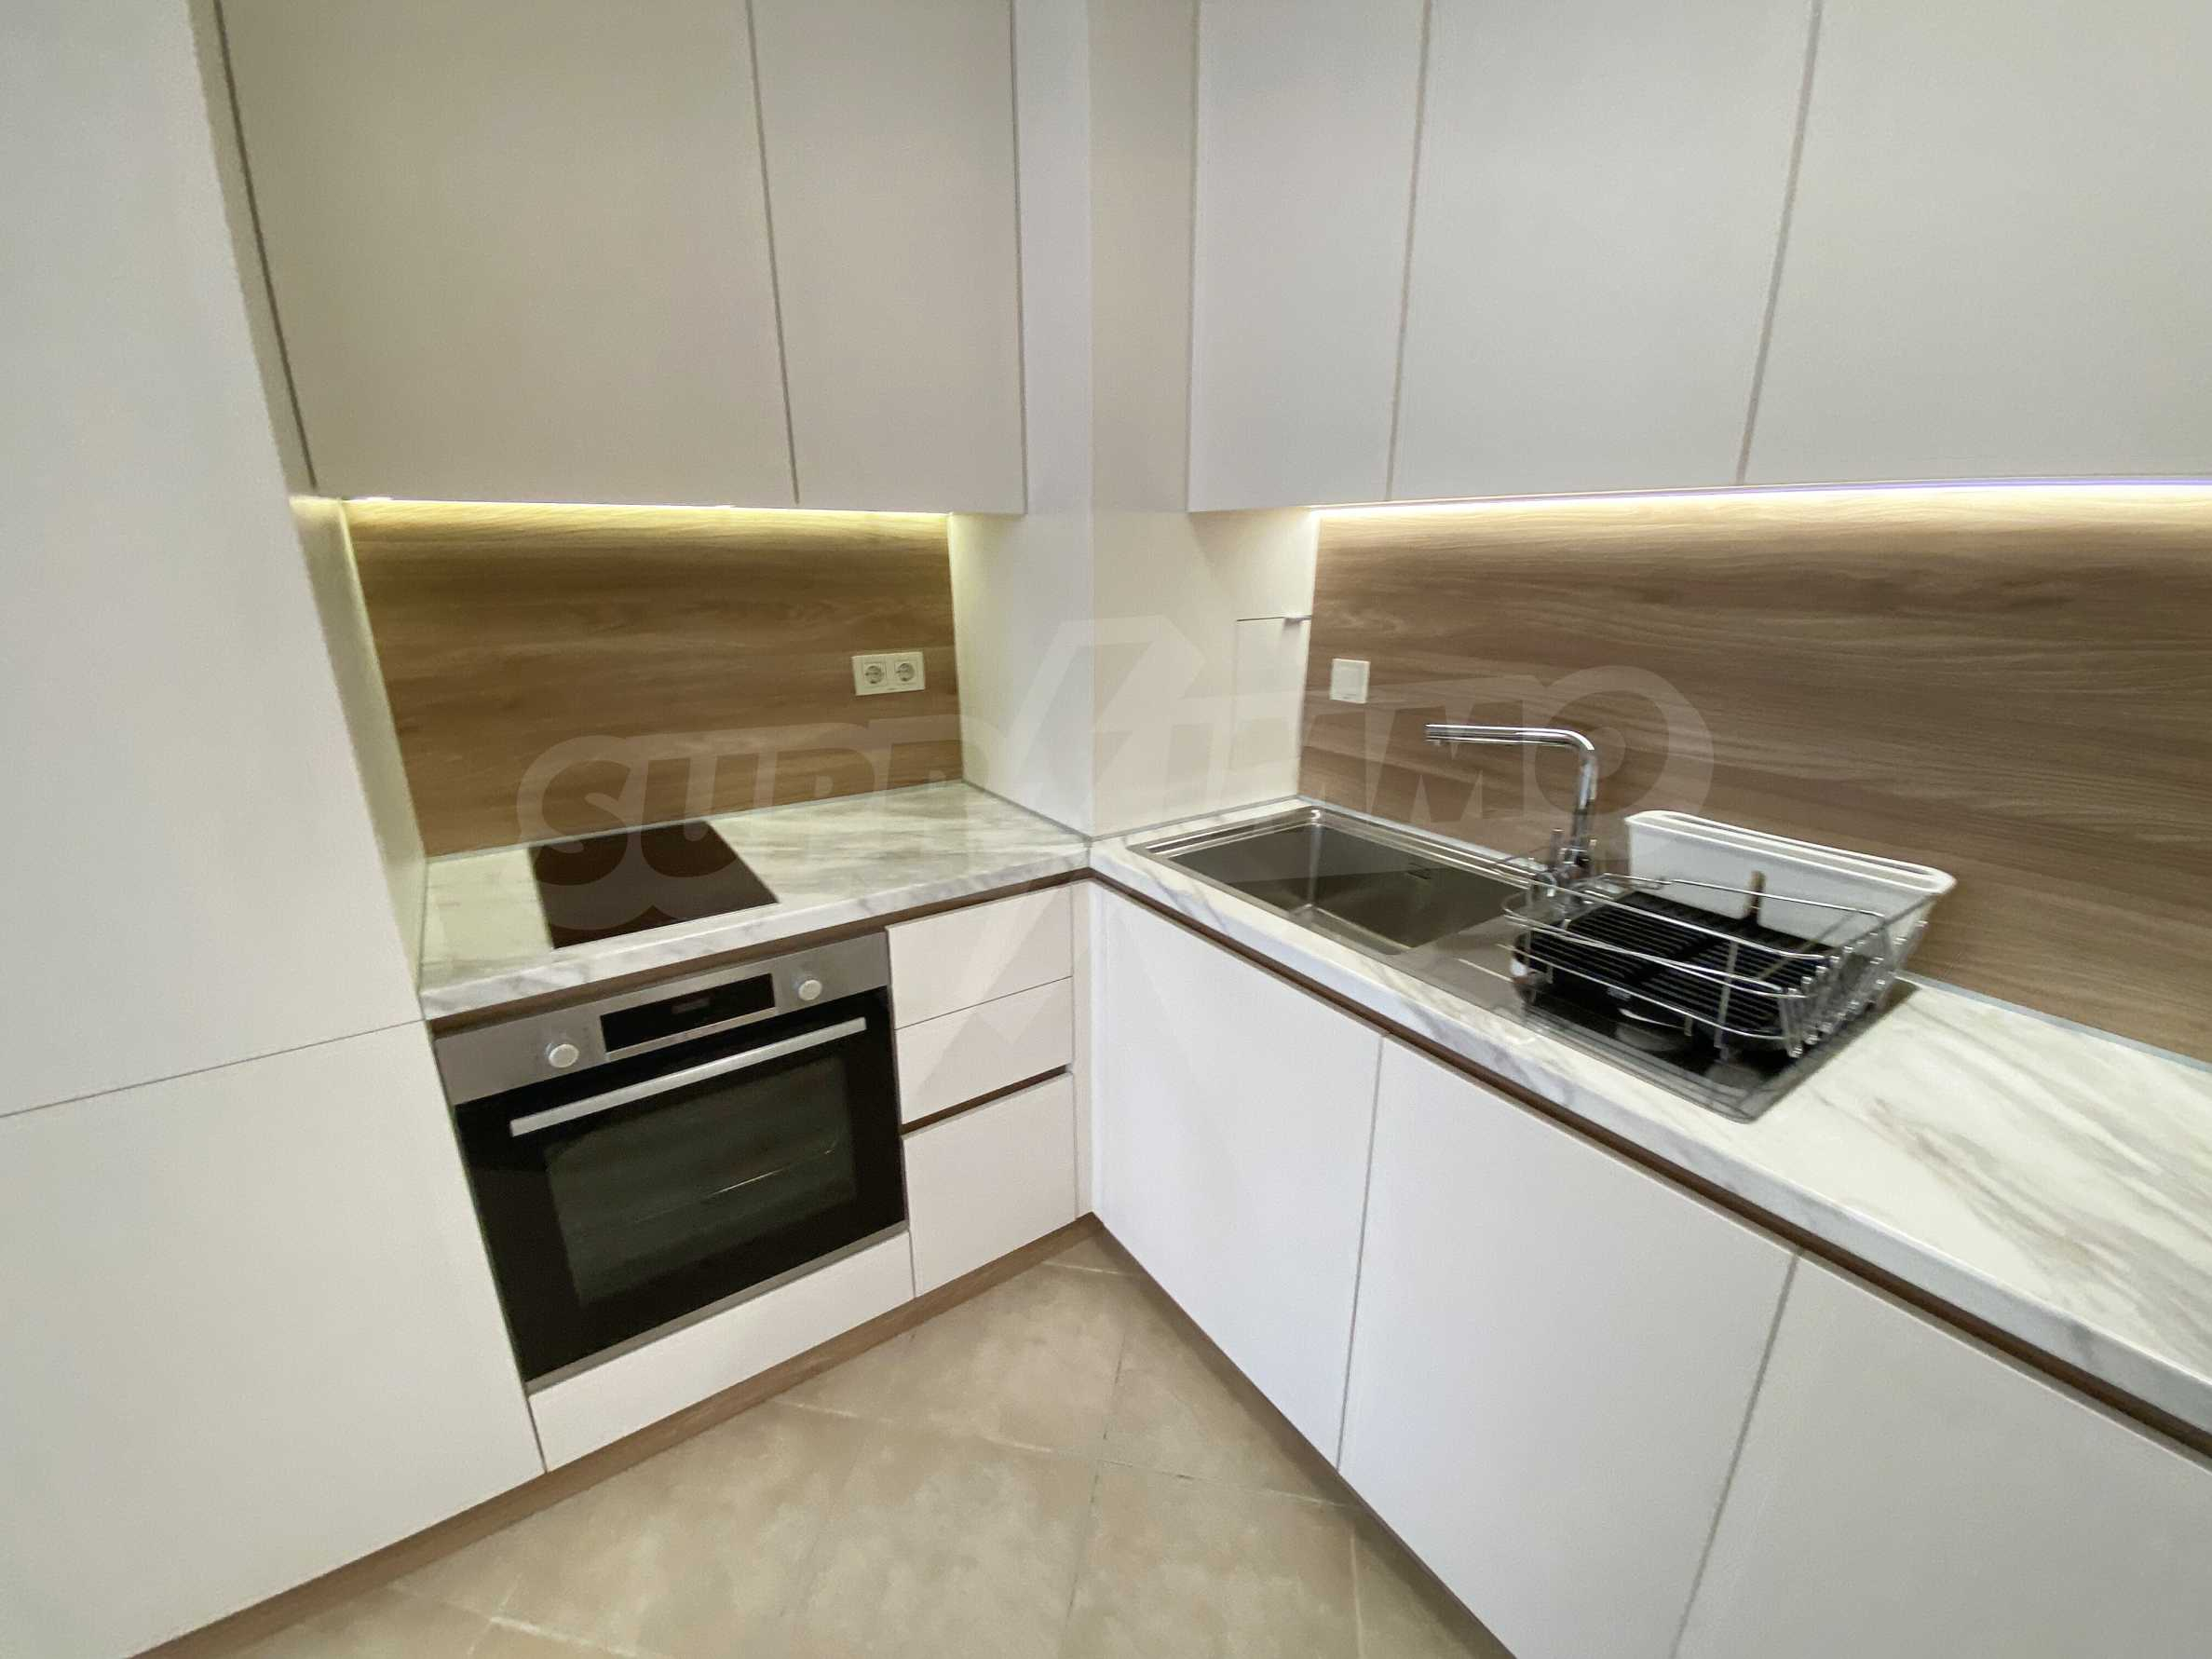 Тристаен апартамент близо до плажа в комплекс Емберли в Лозенец (ап. №201) 6